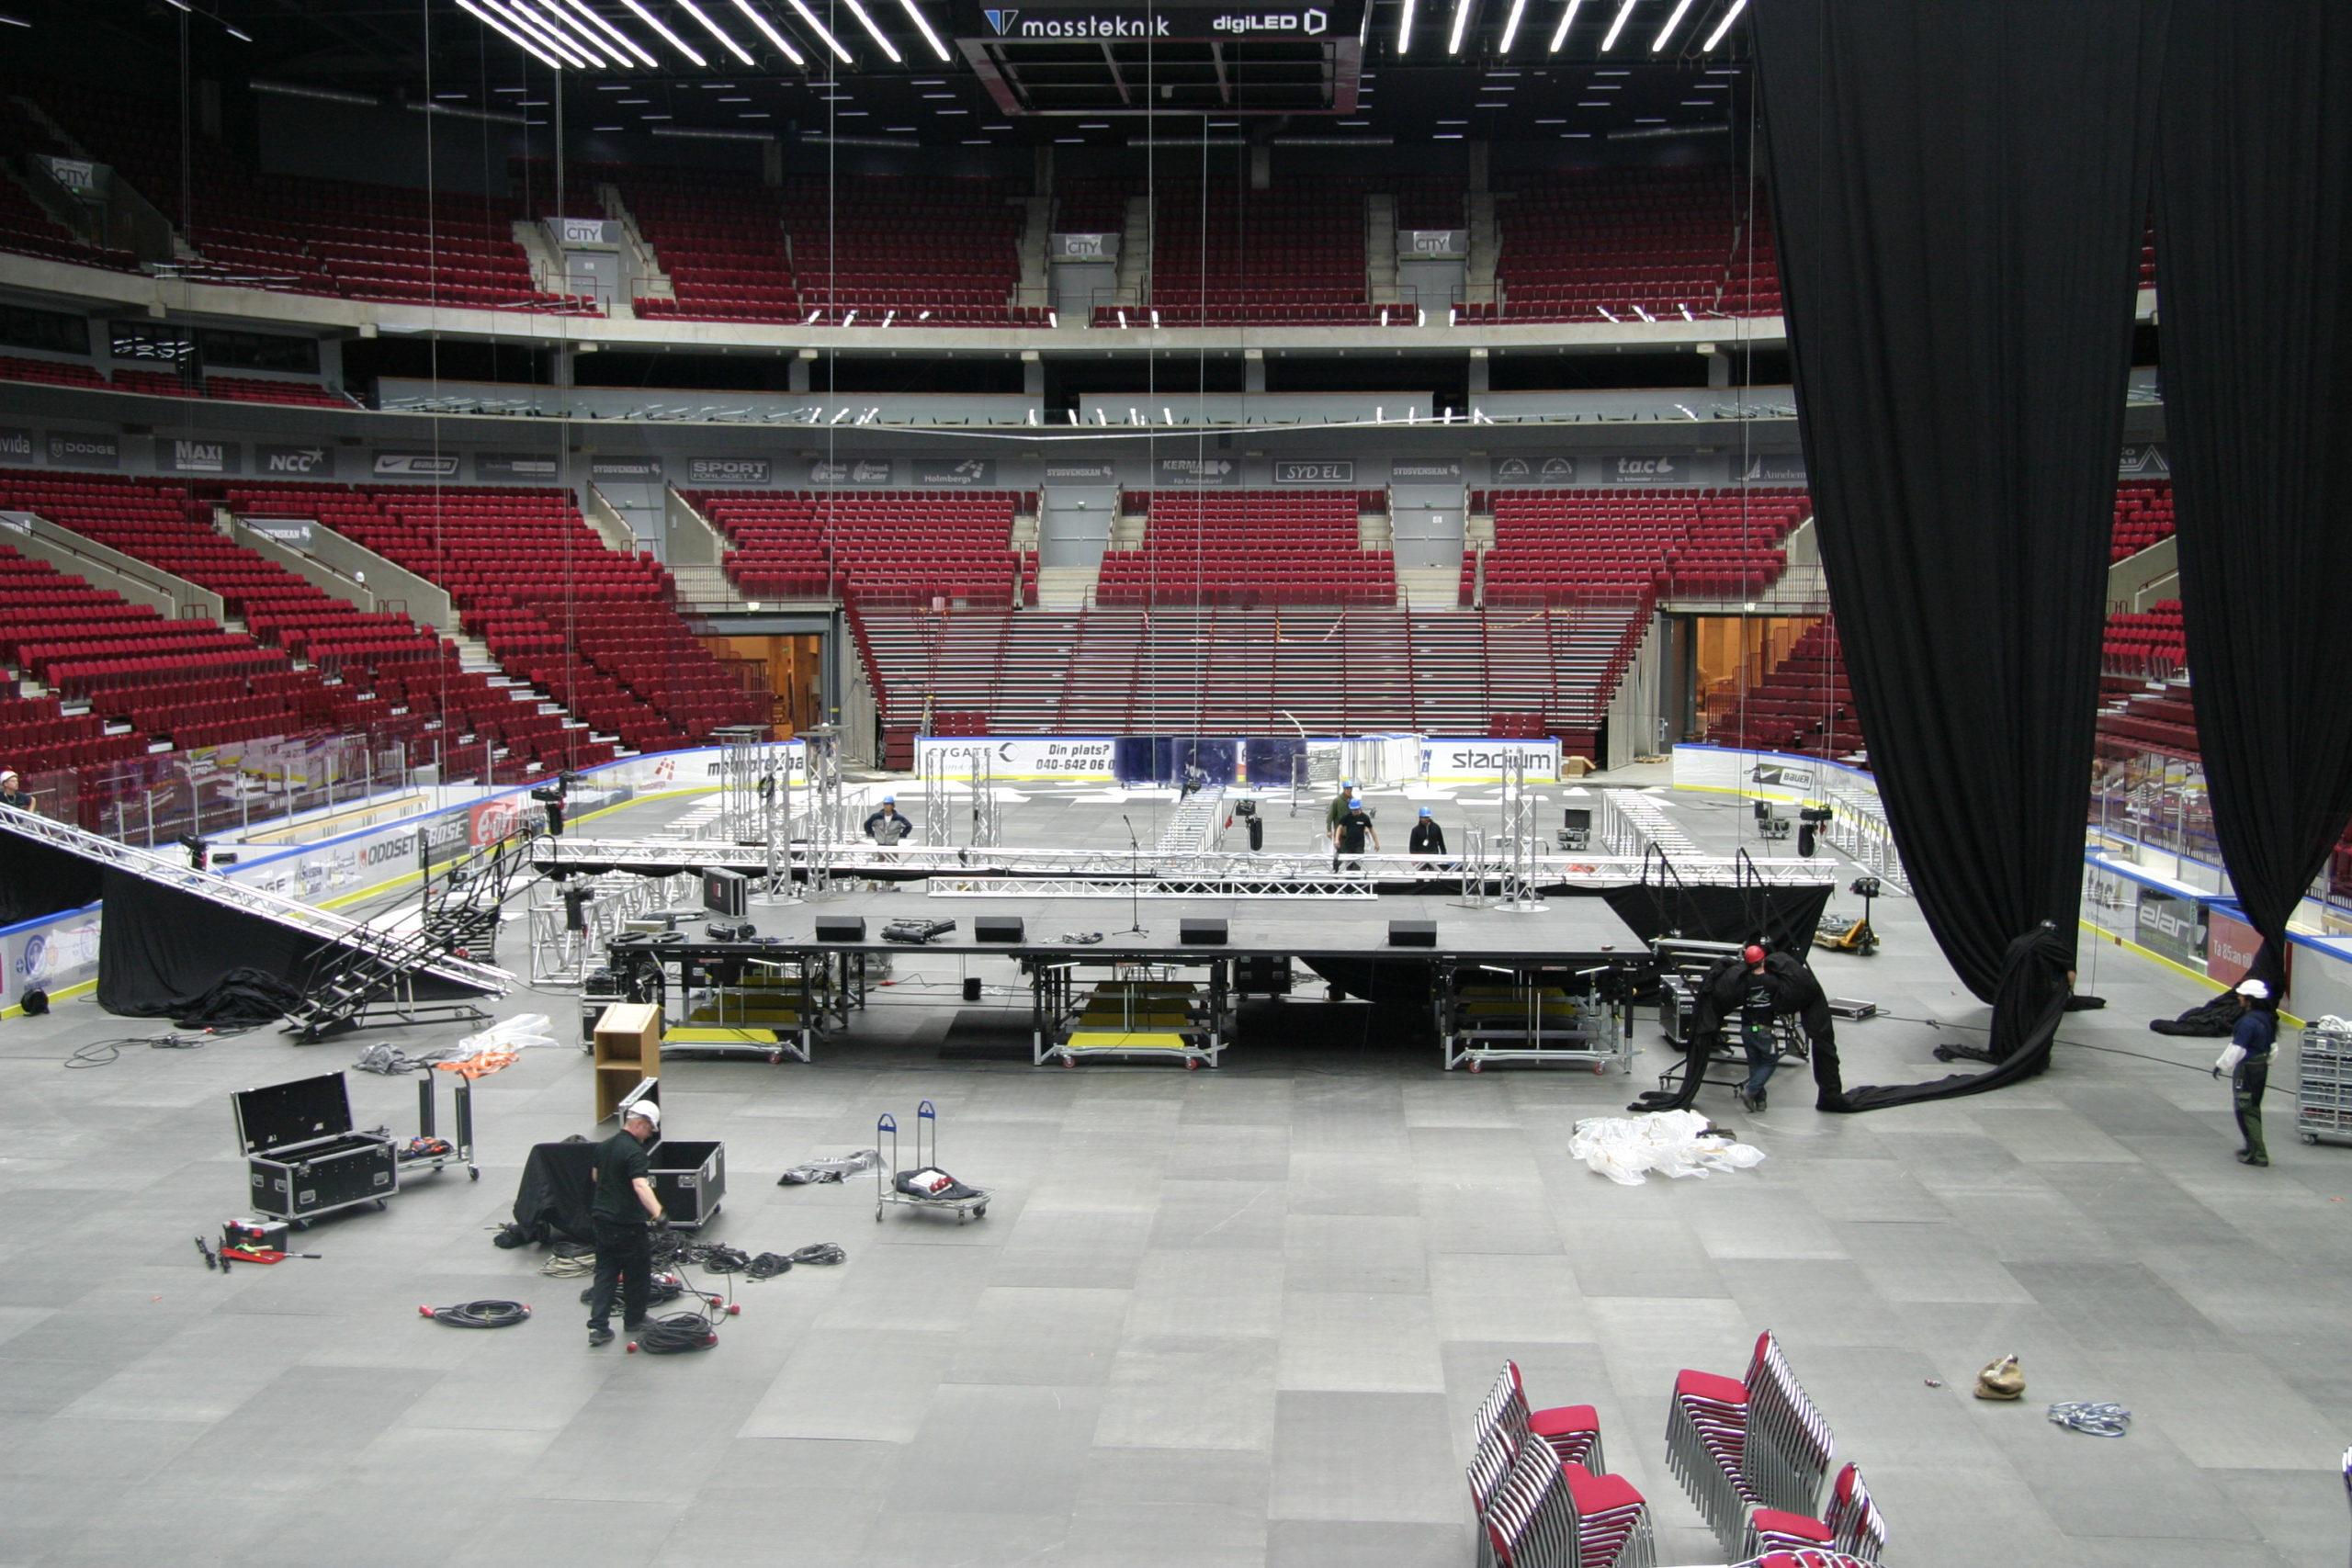 Scenbygge i Malmö arena